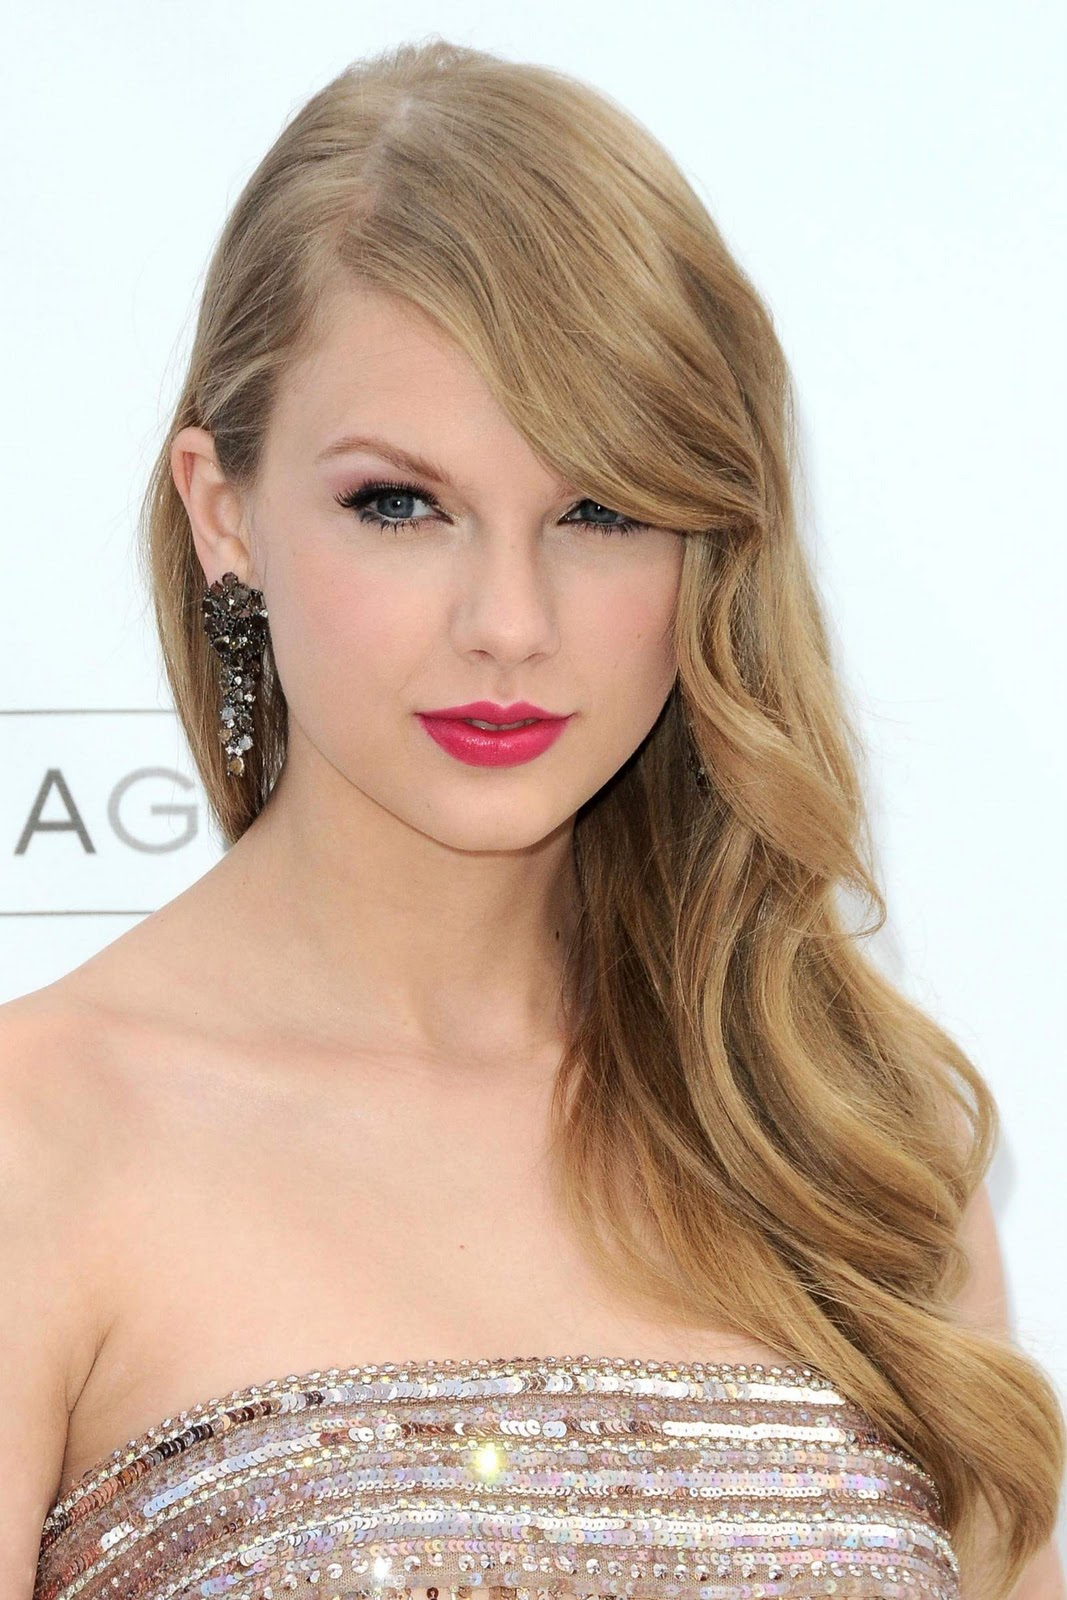 http://2.bp.blogspot.com/-mAvhPrxXbG0/Tp-tmwaMGbI/AAAAAAAABRE/qVq8x0eiys0/s1600/Hot-Taylor-Swift-13.jpg